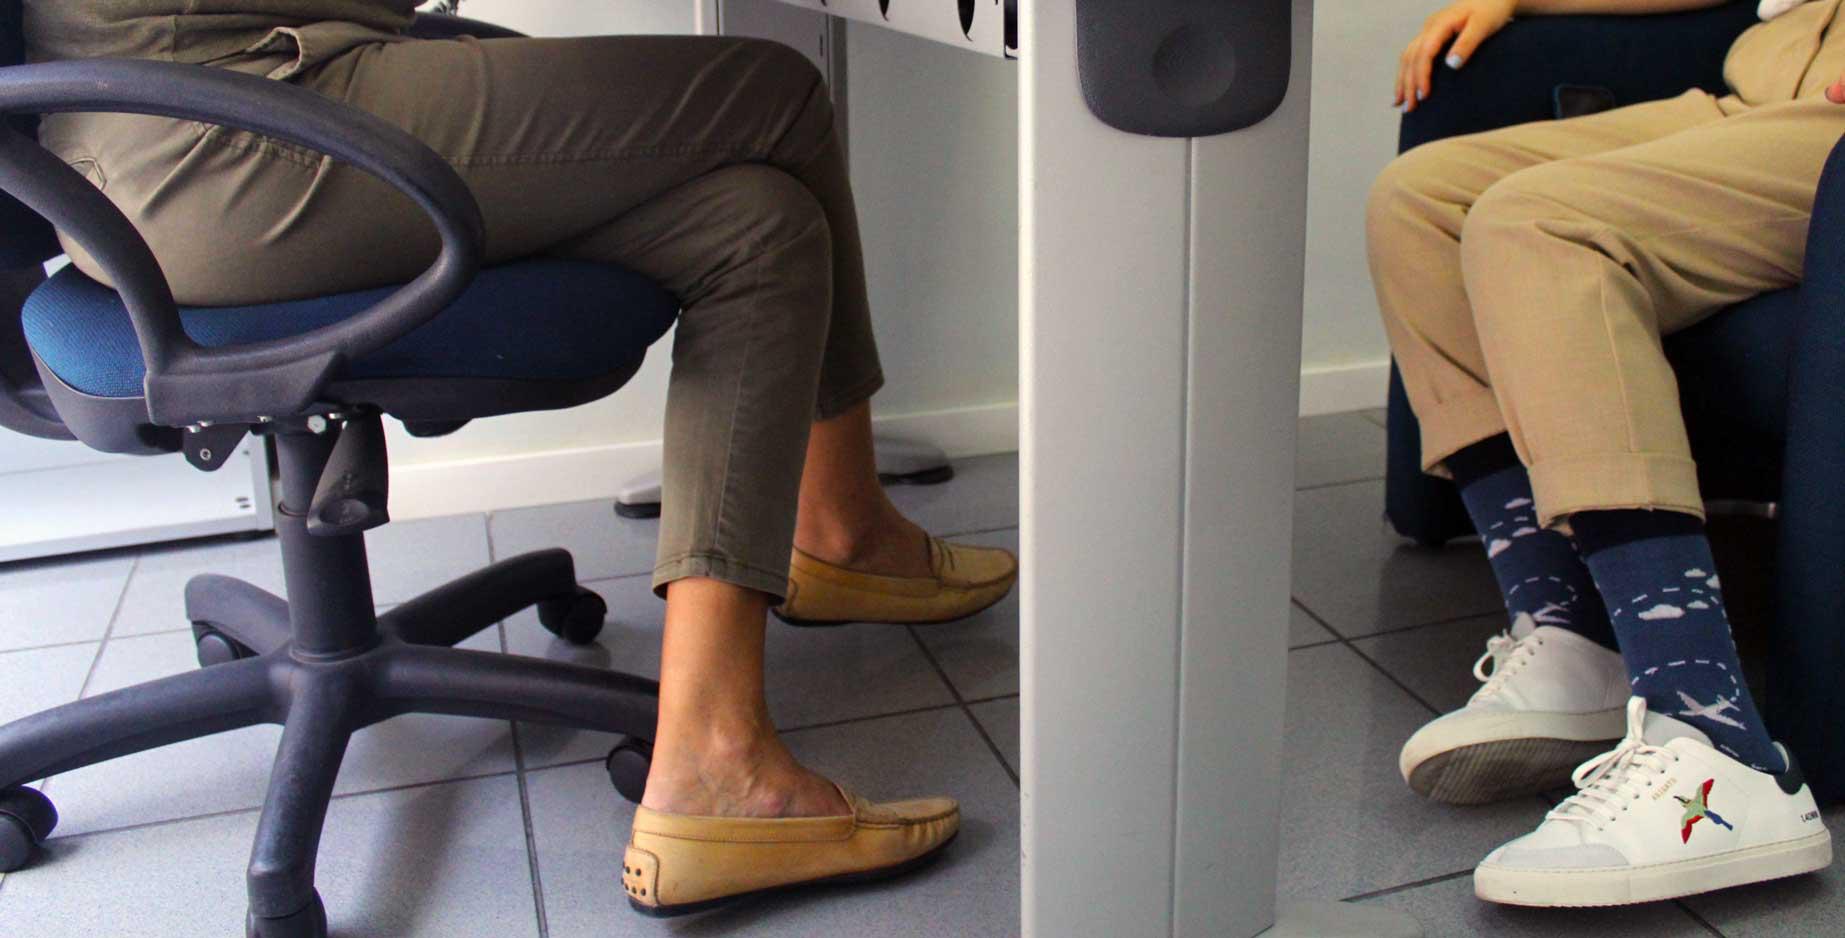 Funky socks in job interviews - great conversation starters